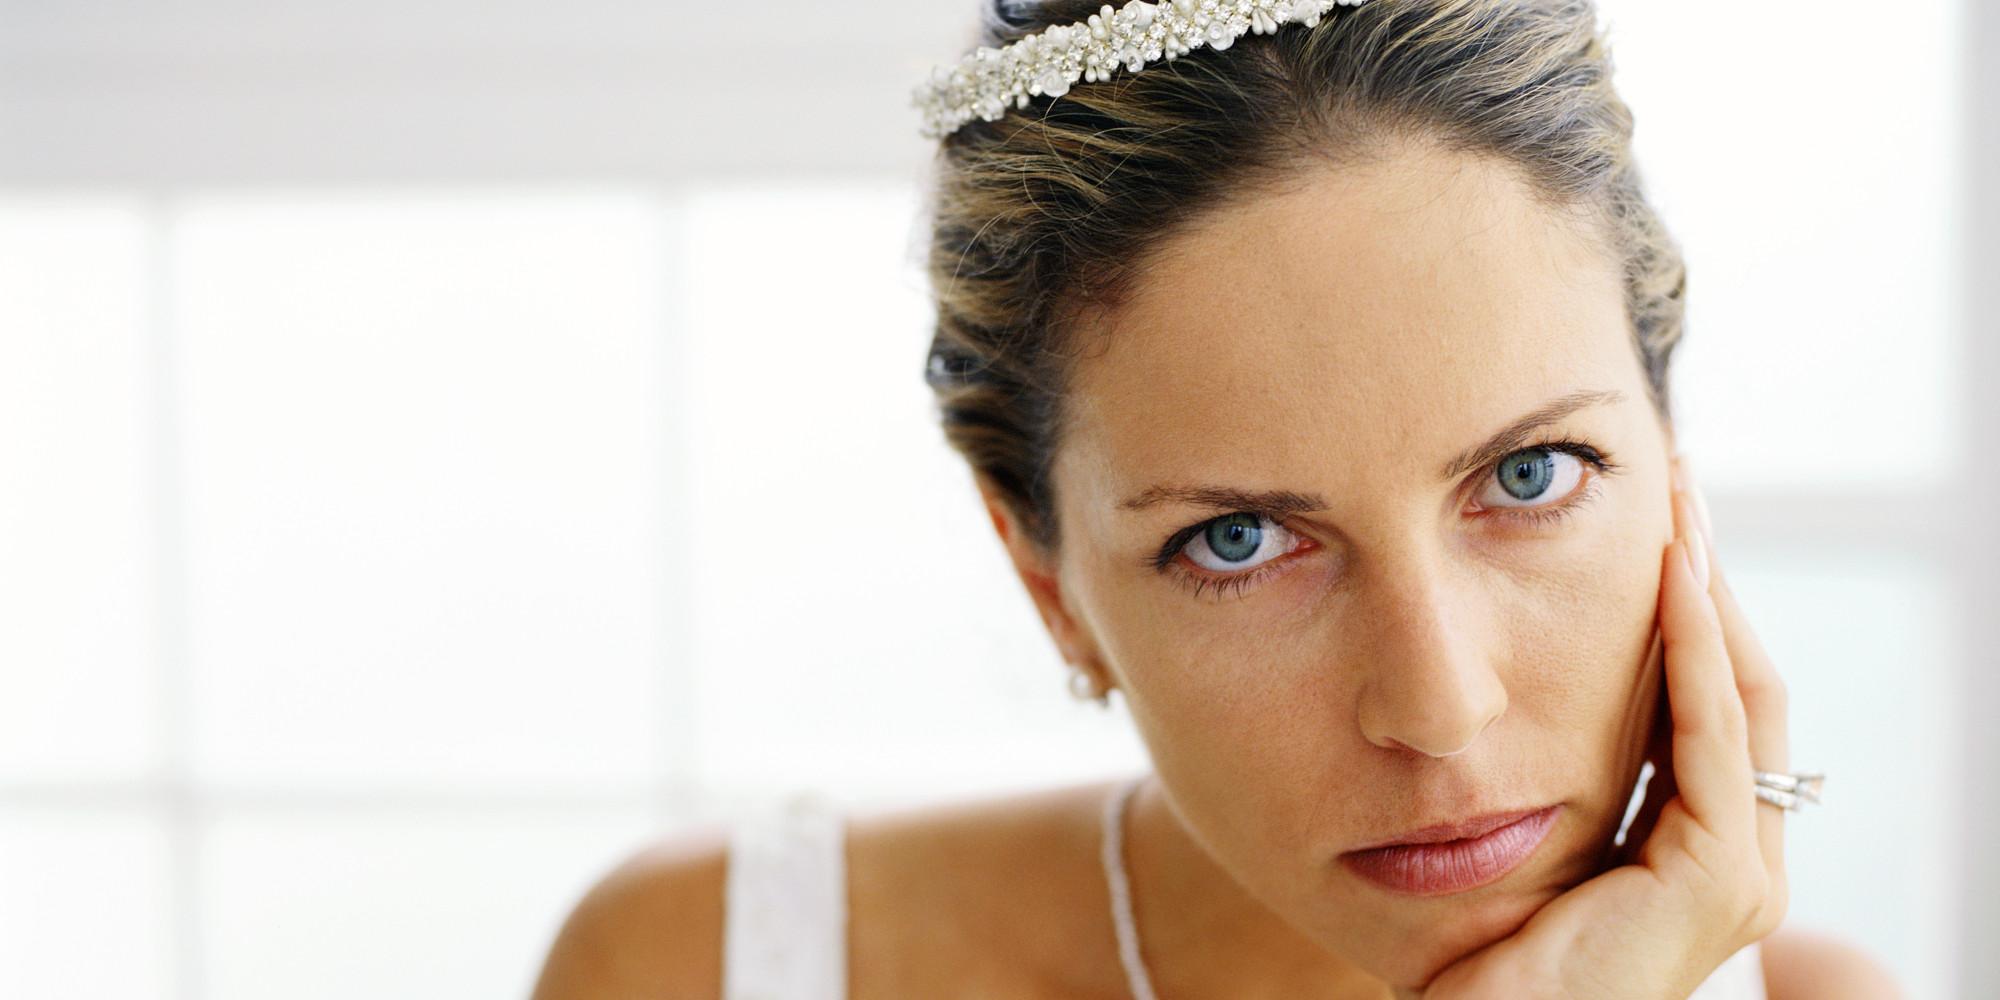 Have any bridezillas gotten divorced dating